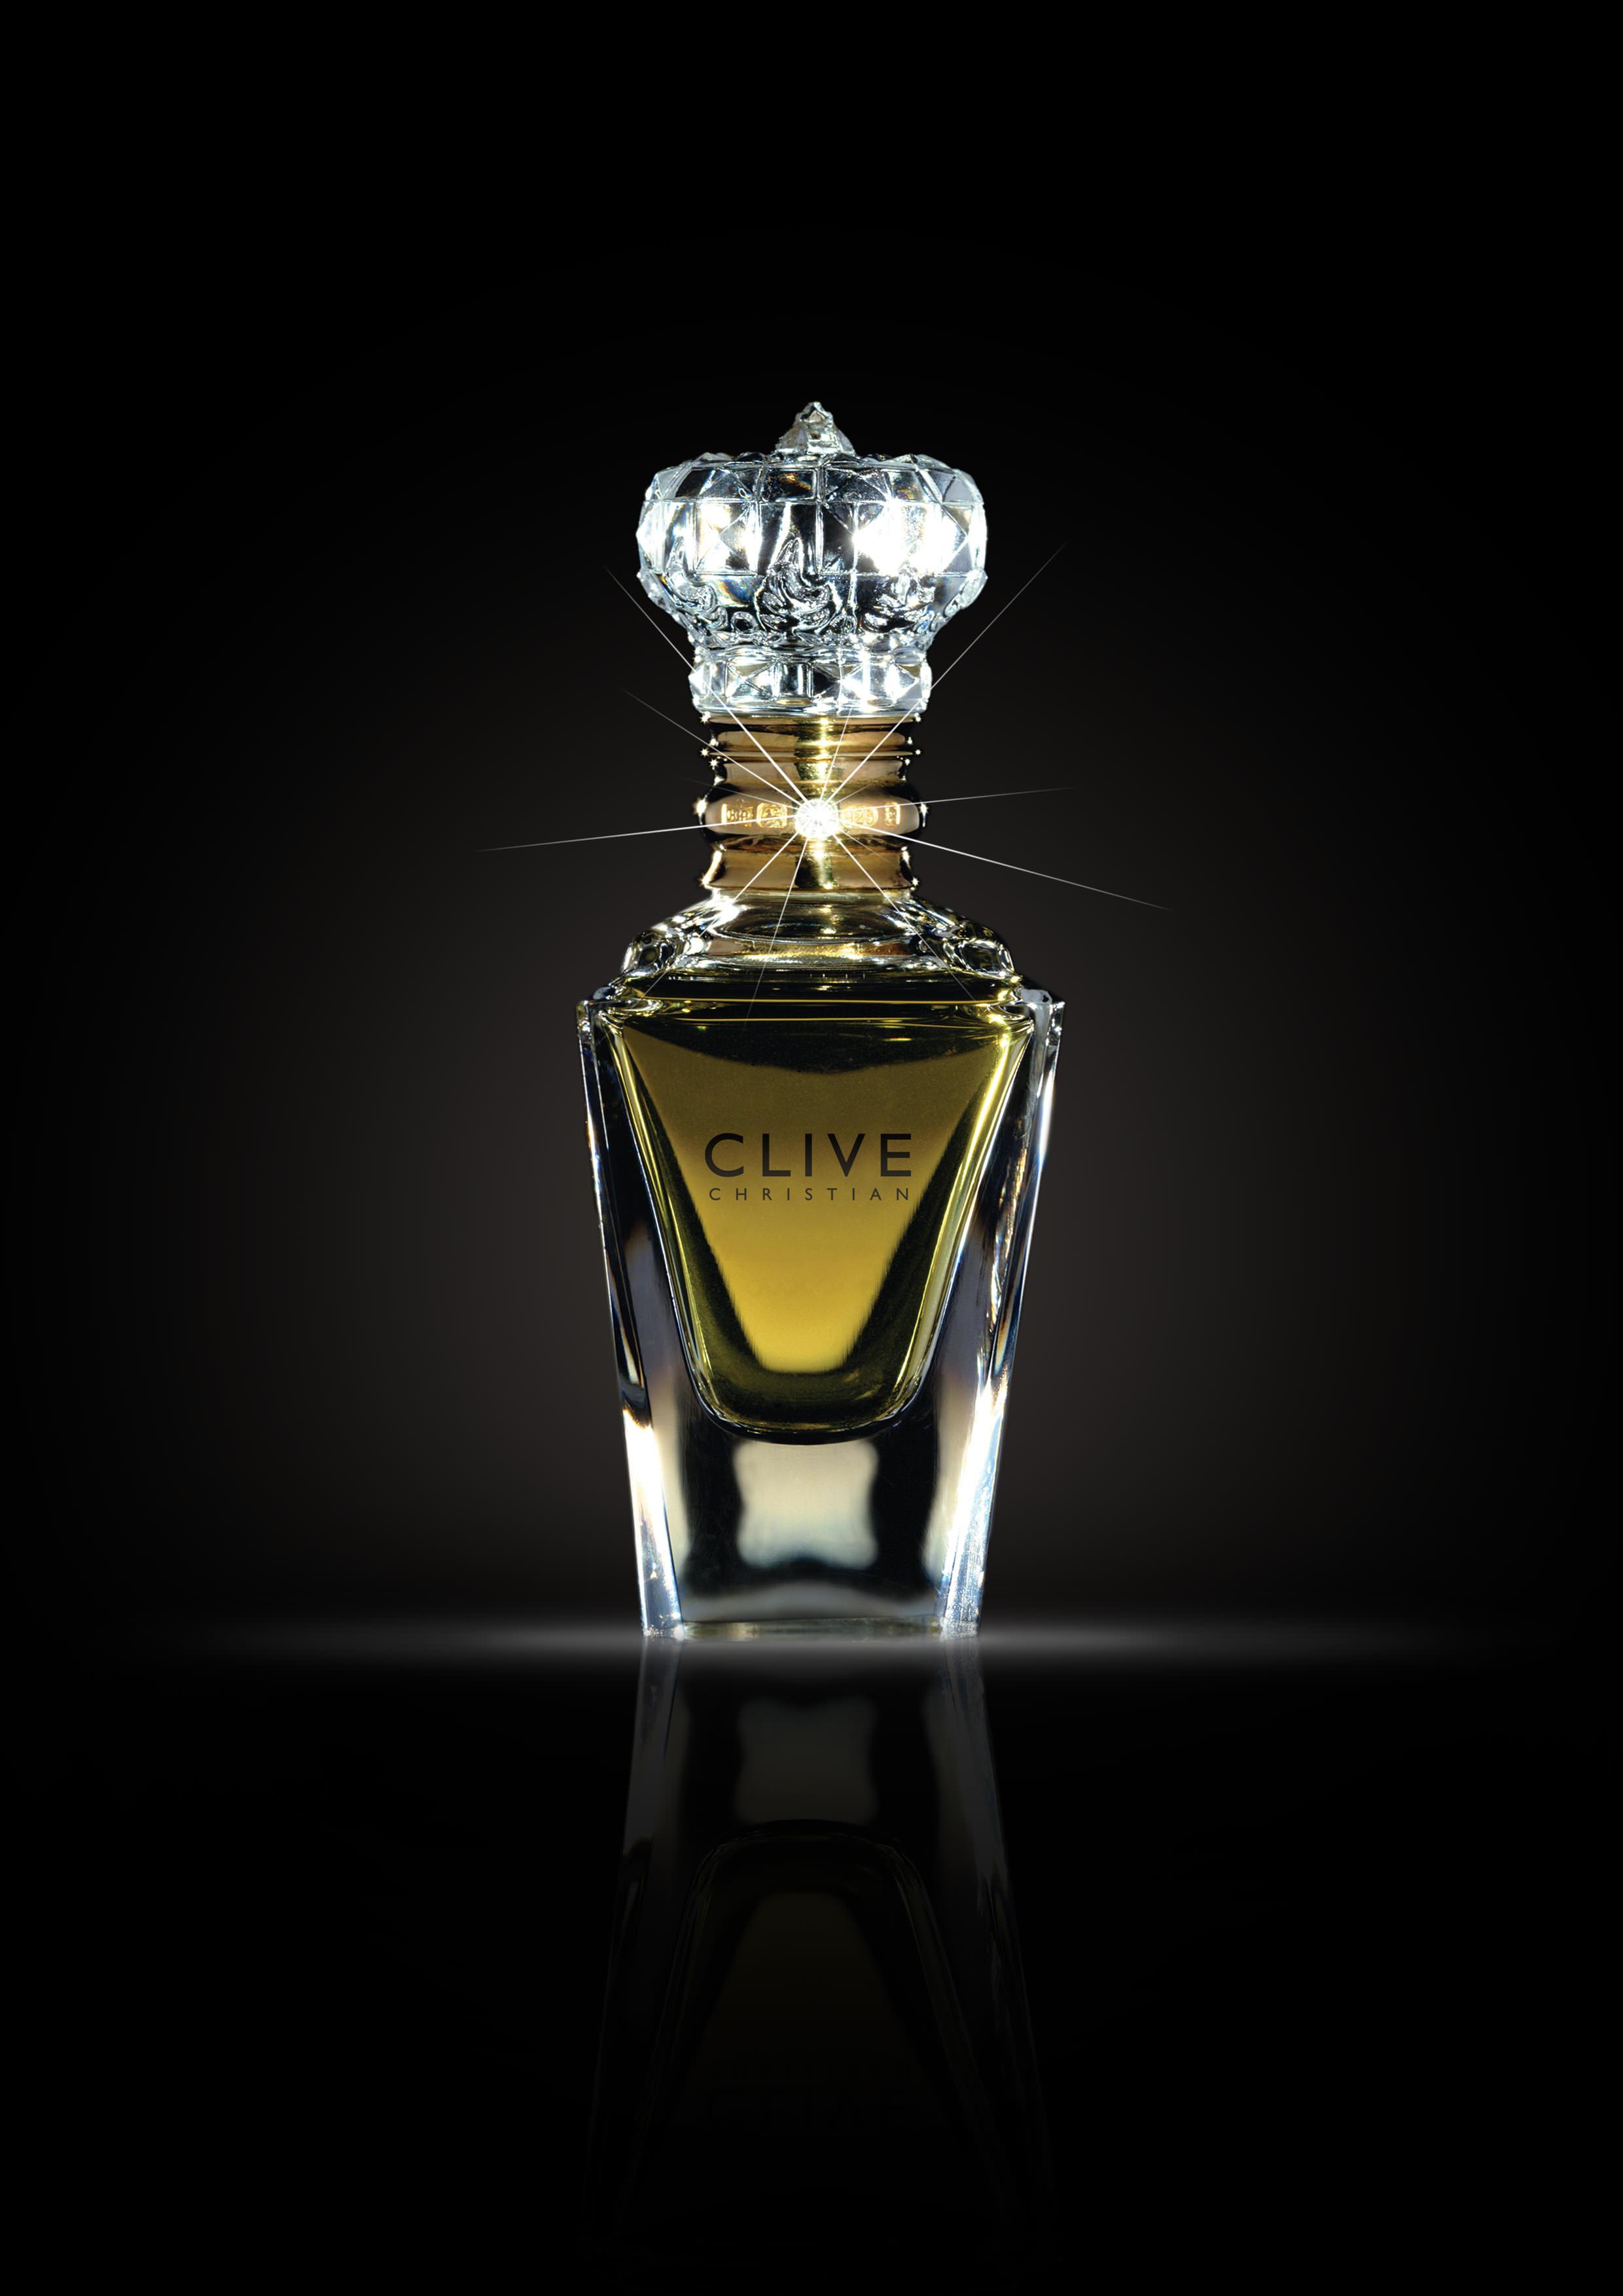 Clive-majesty-edition.jpg